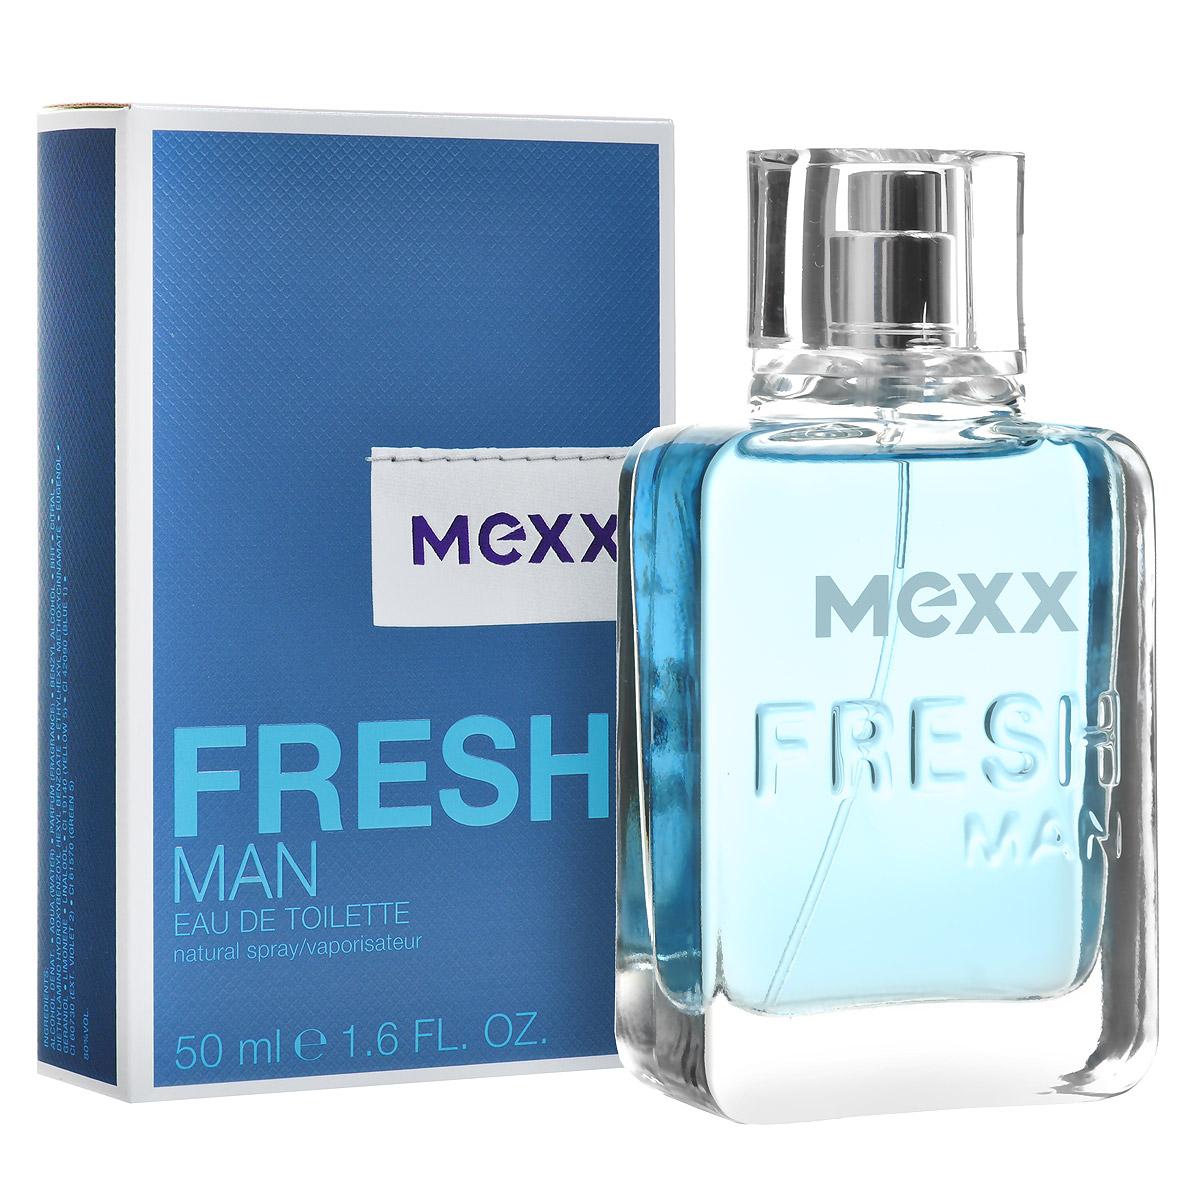 "Mexx Туалетная вода ""Fresh Man"", 50 мл"